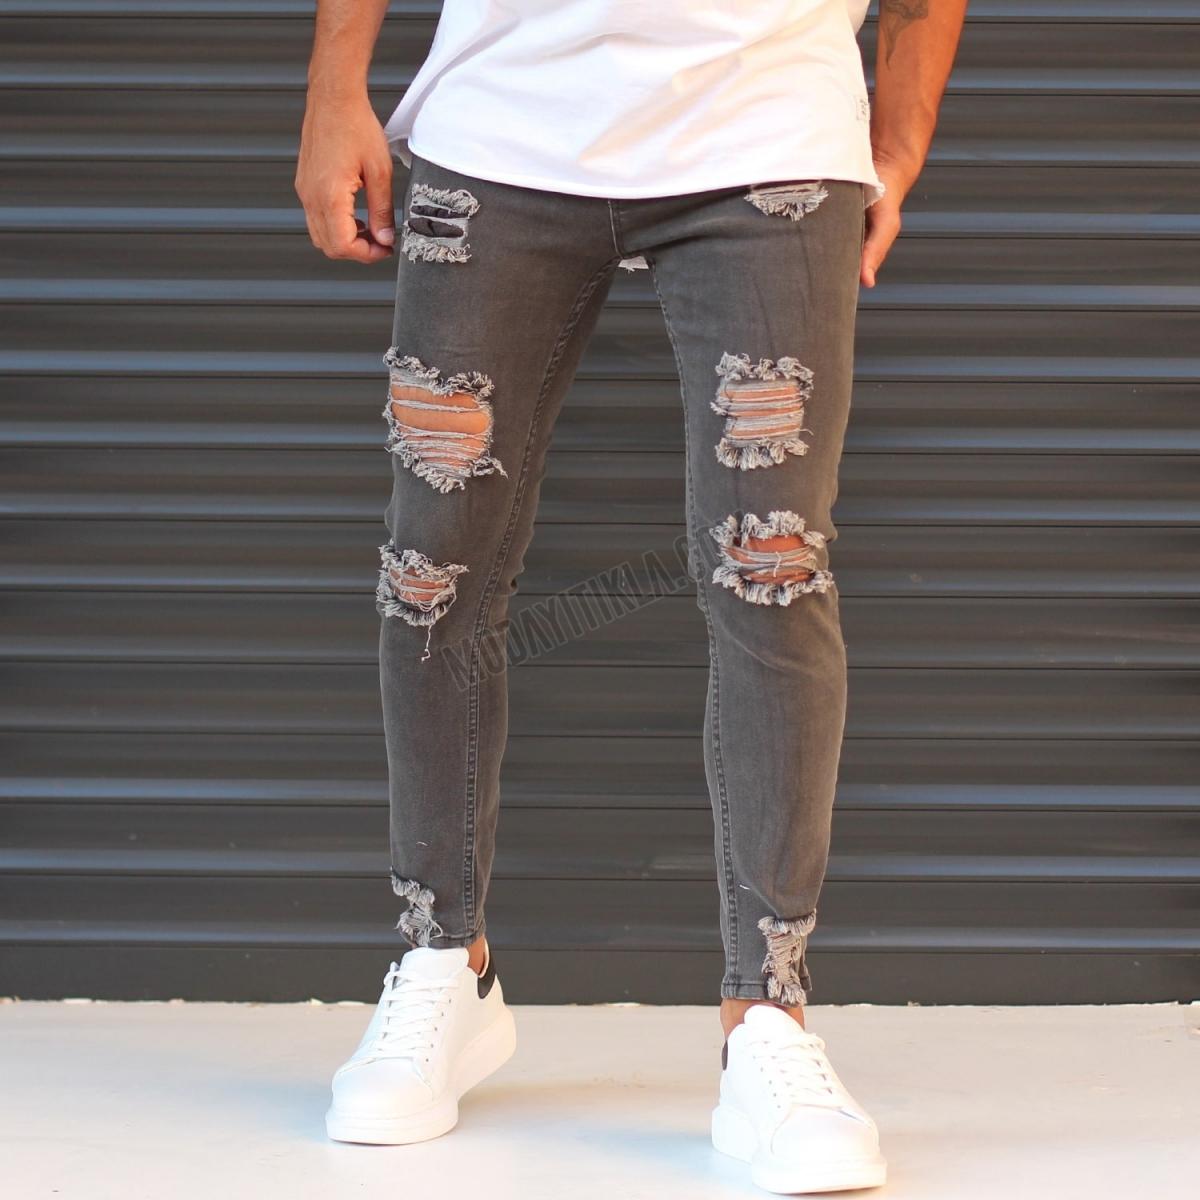 Erkek Dizi Yırtık Dar Paça Füme Jeans